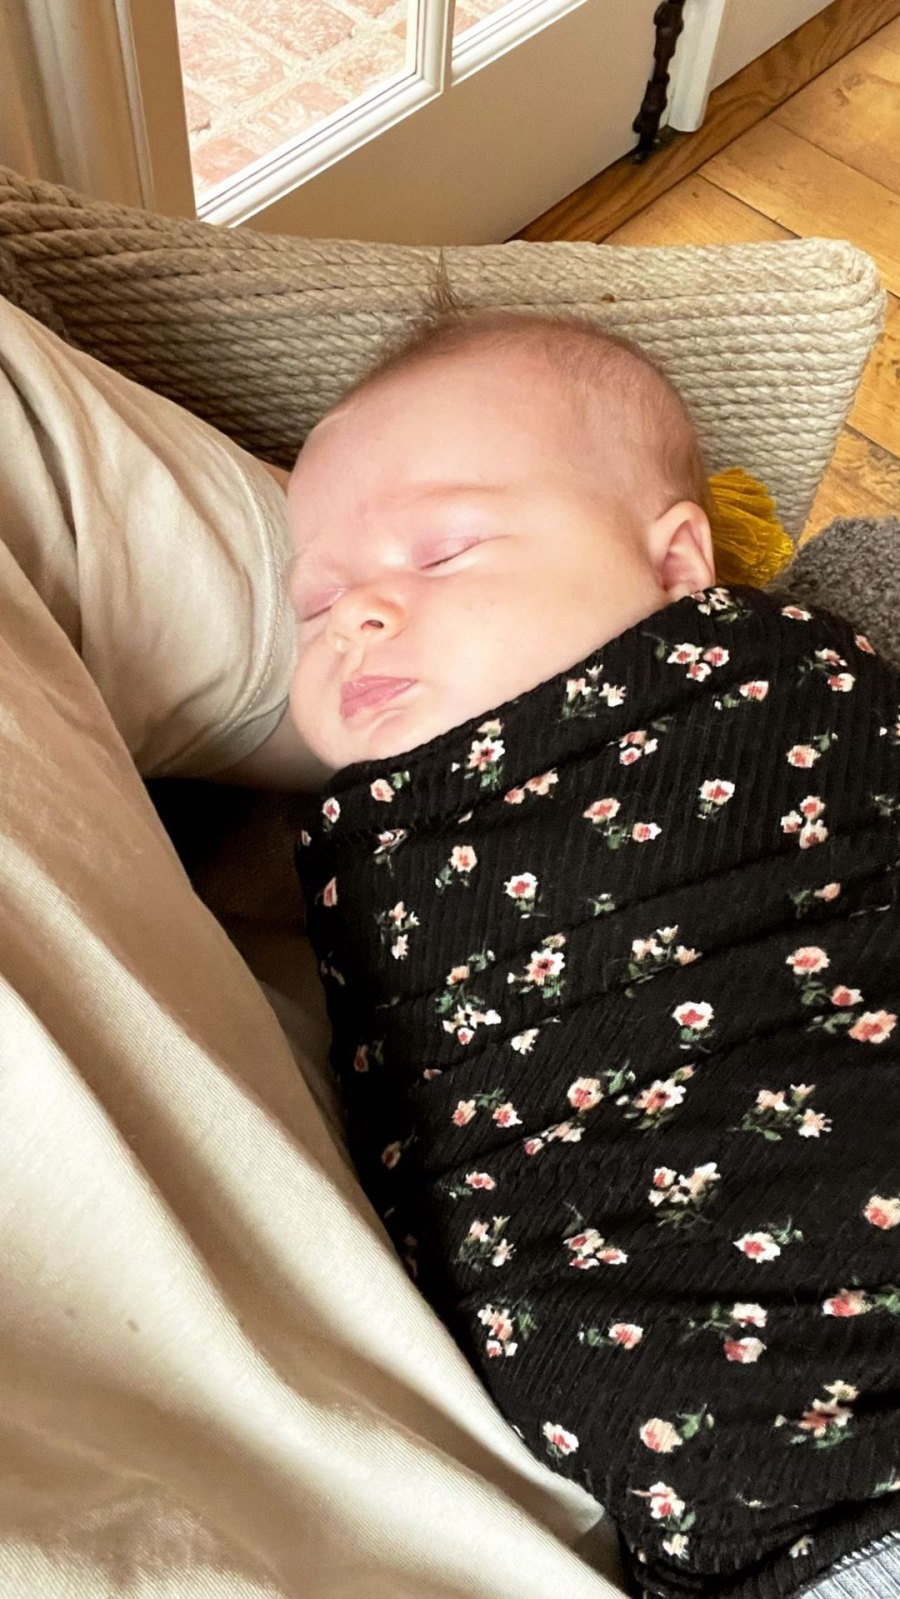 Hilary Duff and Matthew Koma's Daughter Mae's Baby Album Nap Time